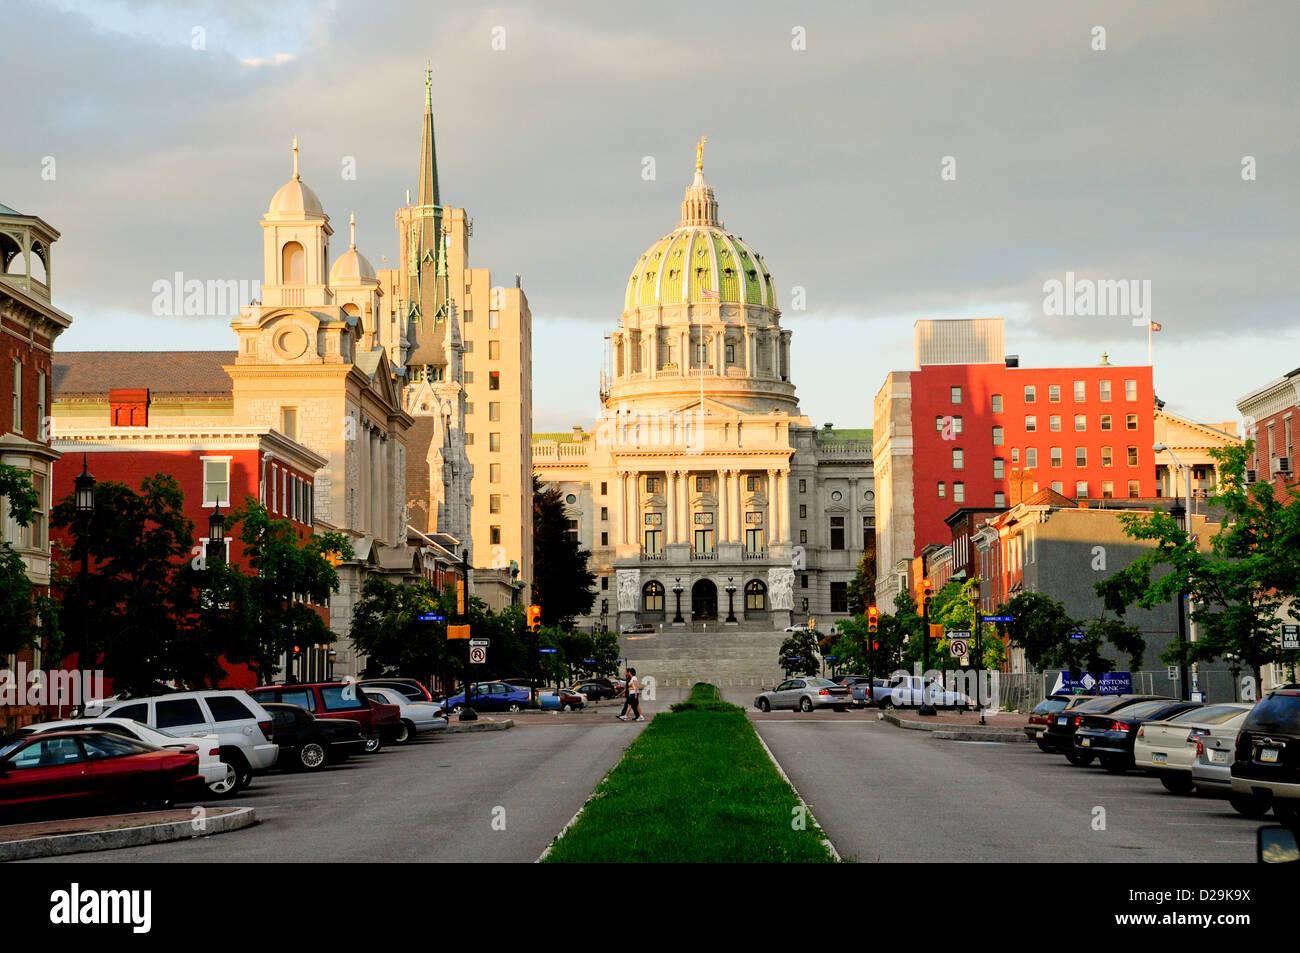 State Capitol, Harrisburg, Pennsylvania - Stock Image